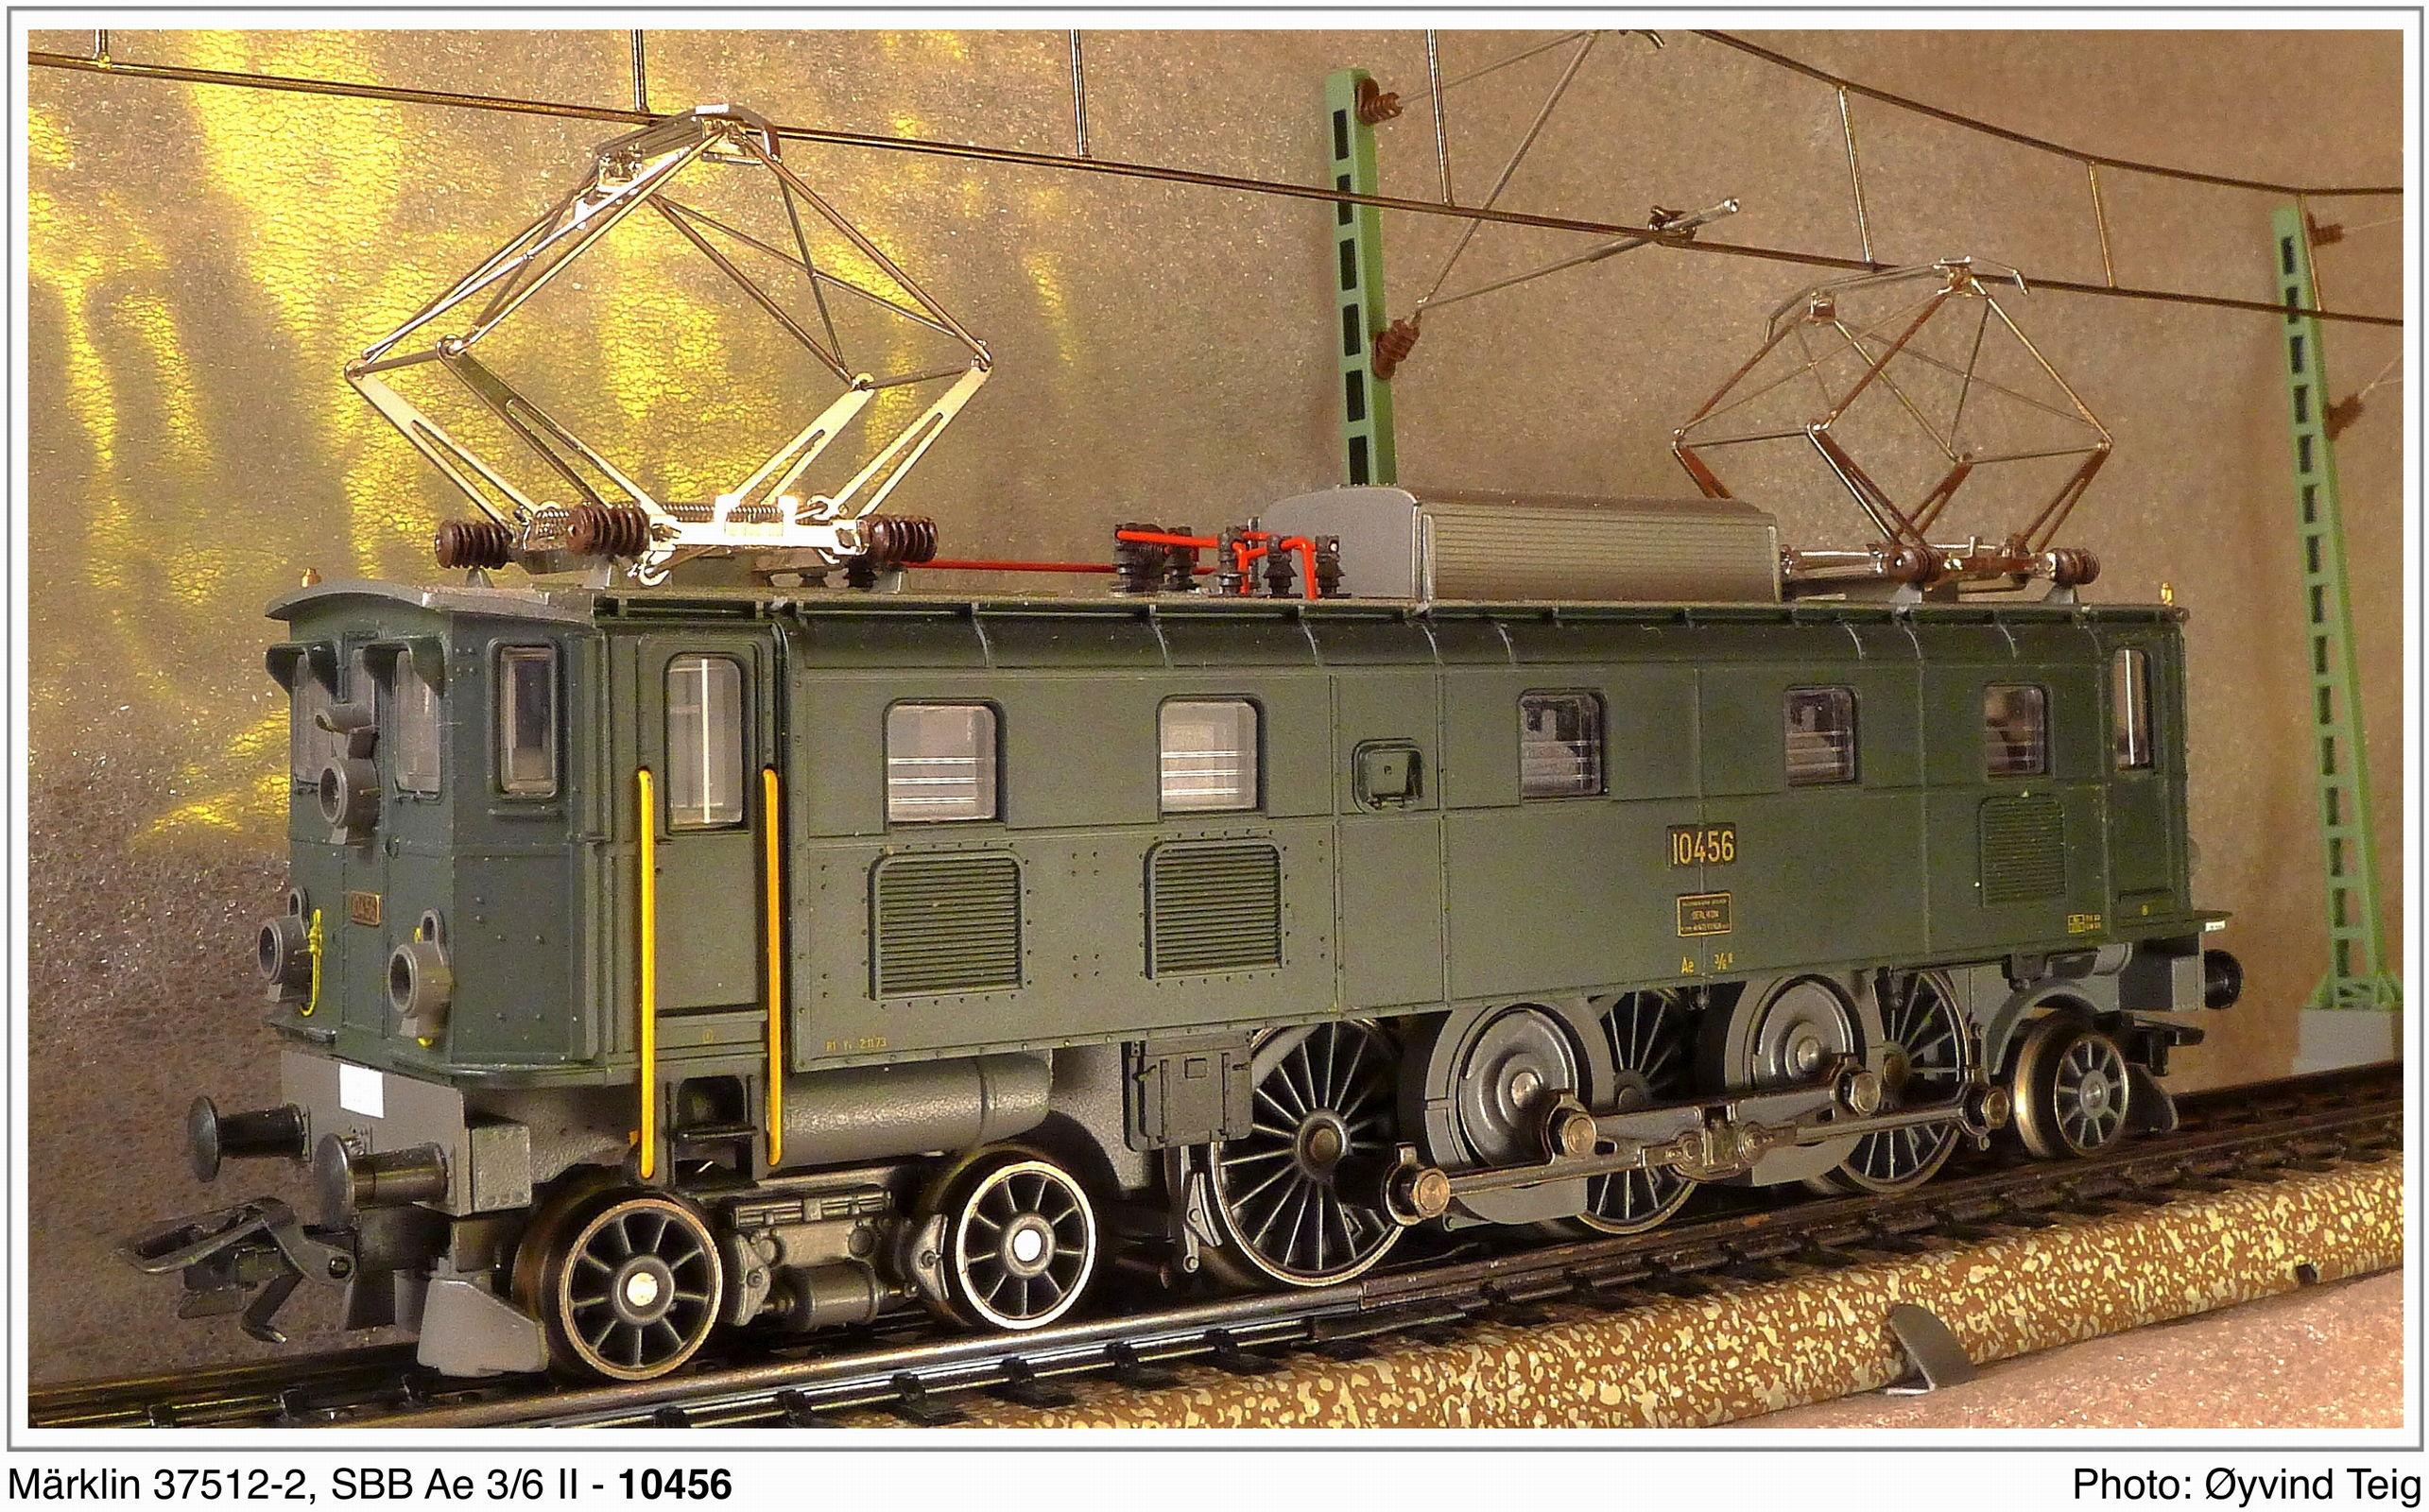 M 228 Rklin 37512 2 Large 216 Yvind Teig